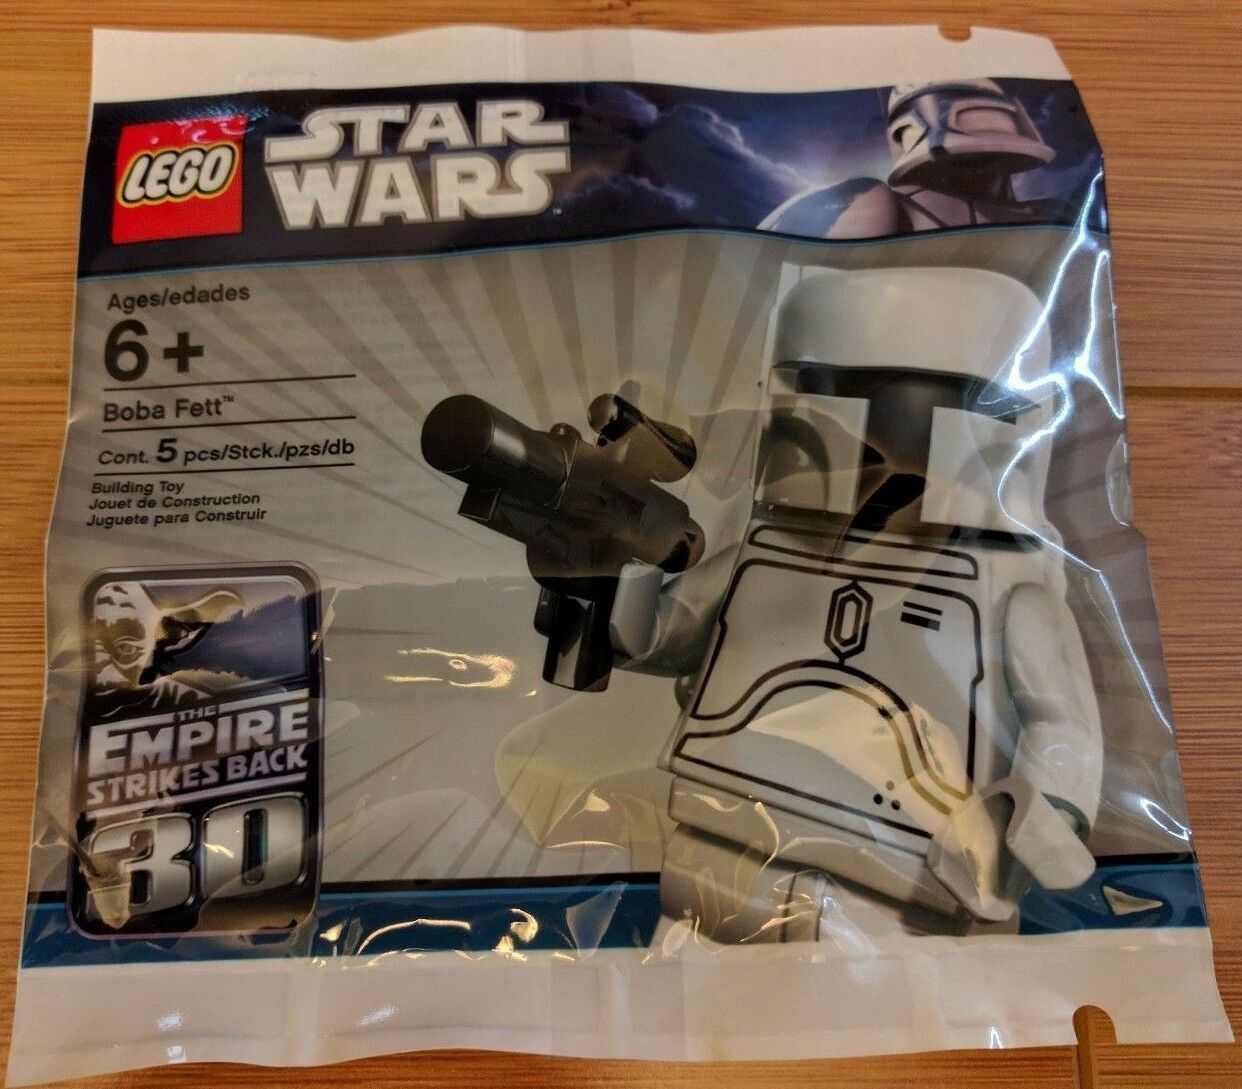 NEW LEGO Star Wars White Boba Fett Minifigure Ltd Edition 30th Anniversary